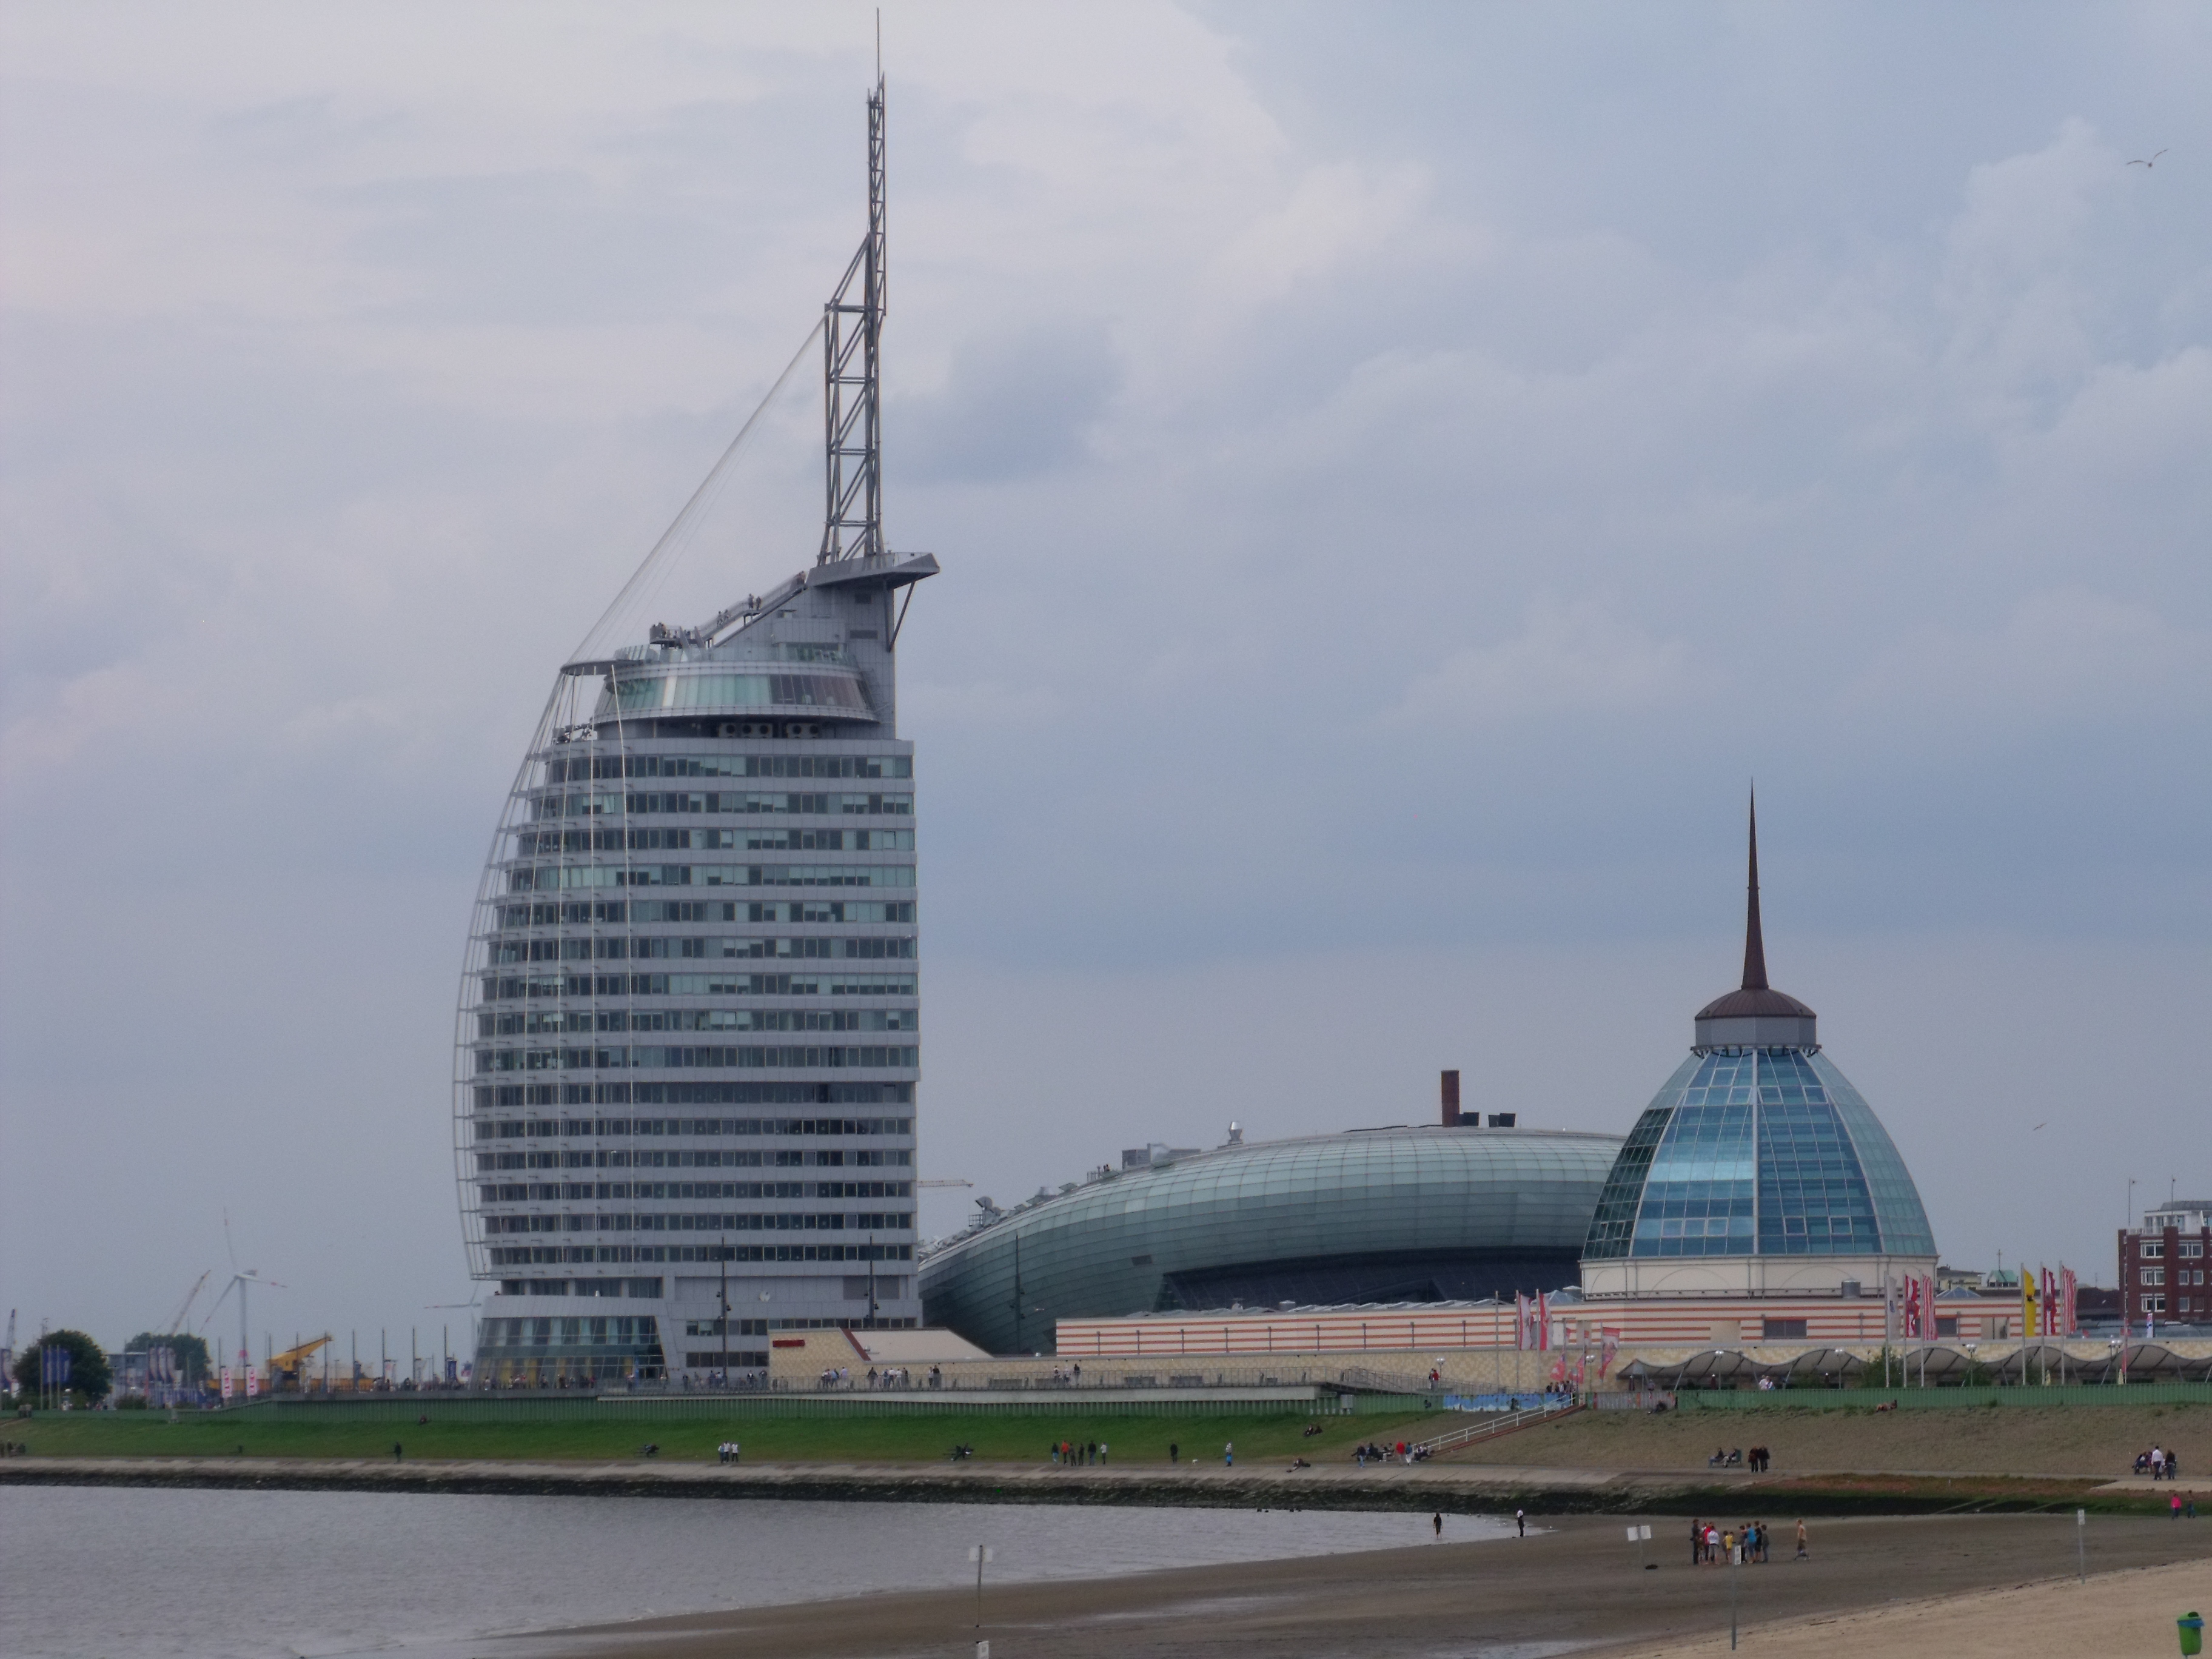 Bremerhaven Hotel Atlantic Sail City